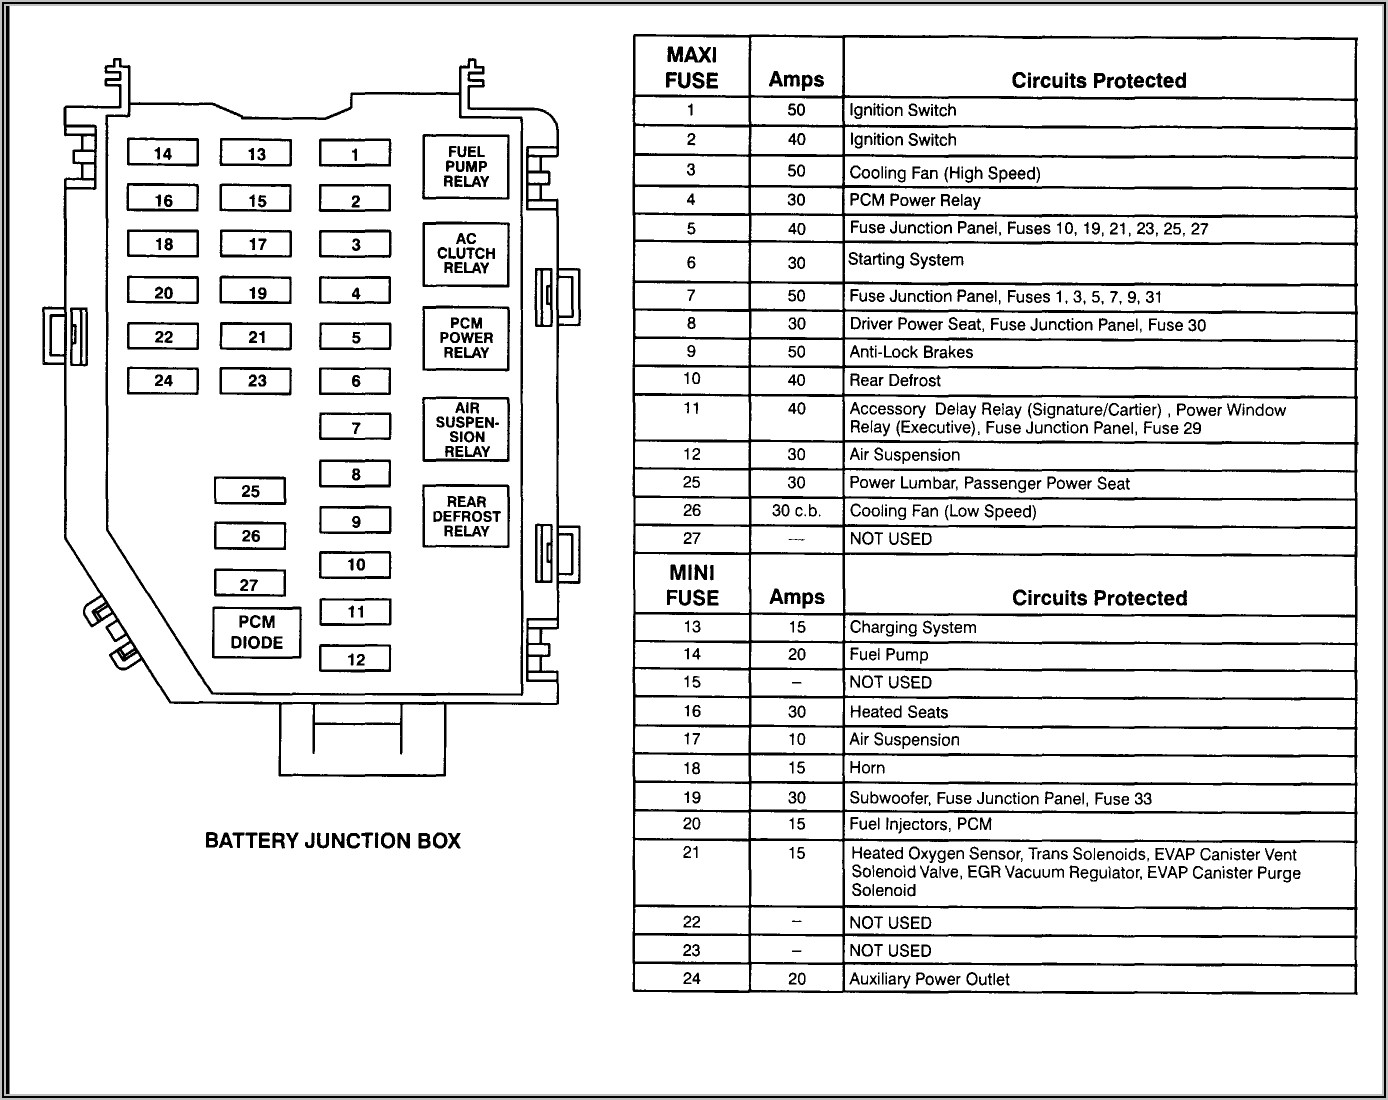 2010 Ford F150 Fuse Box Diagram